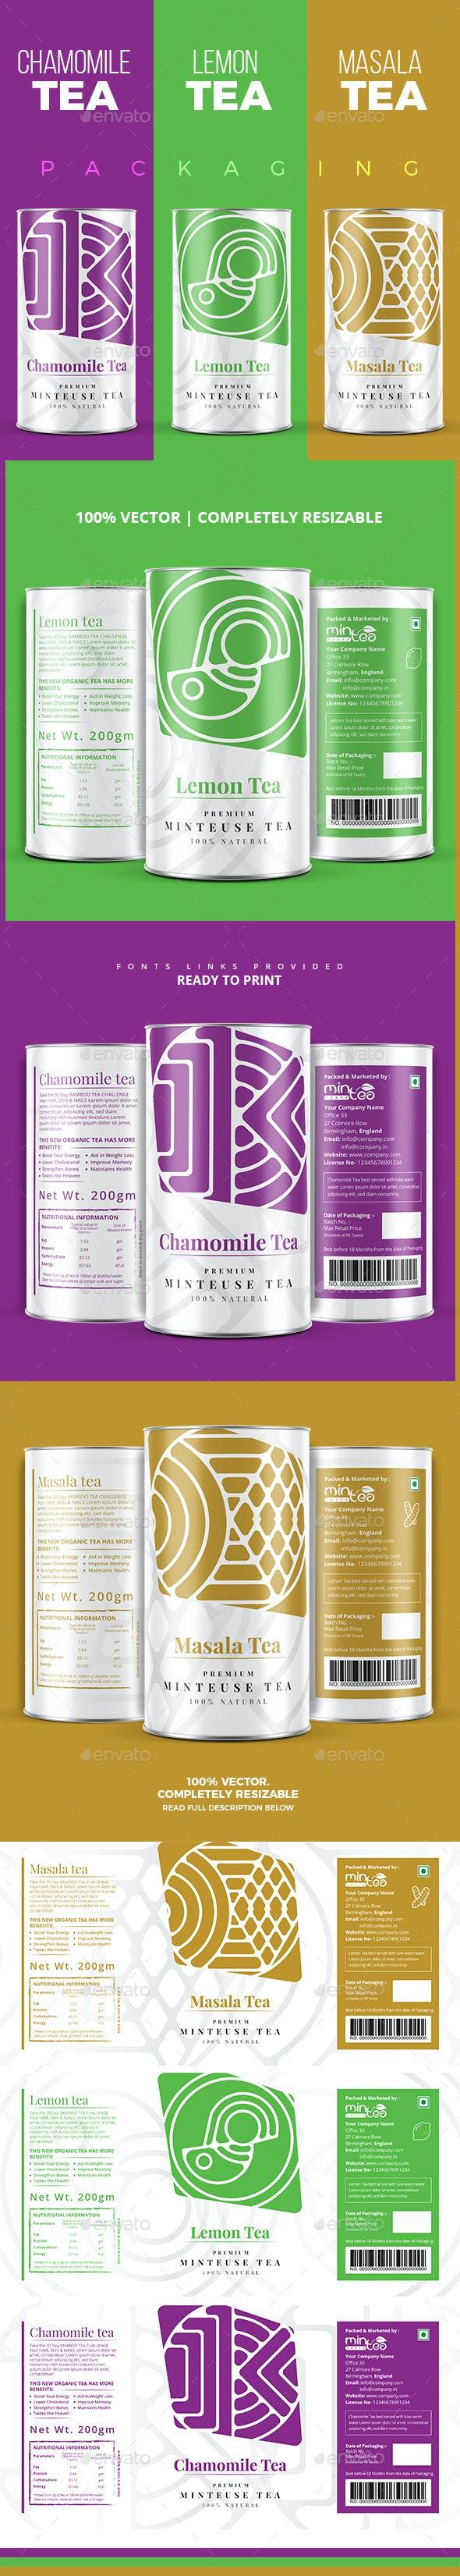 Chamomile | Lemon | Masala Tea Packaging - Packaging Print Templates